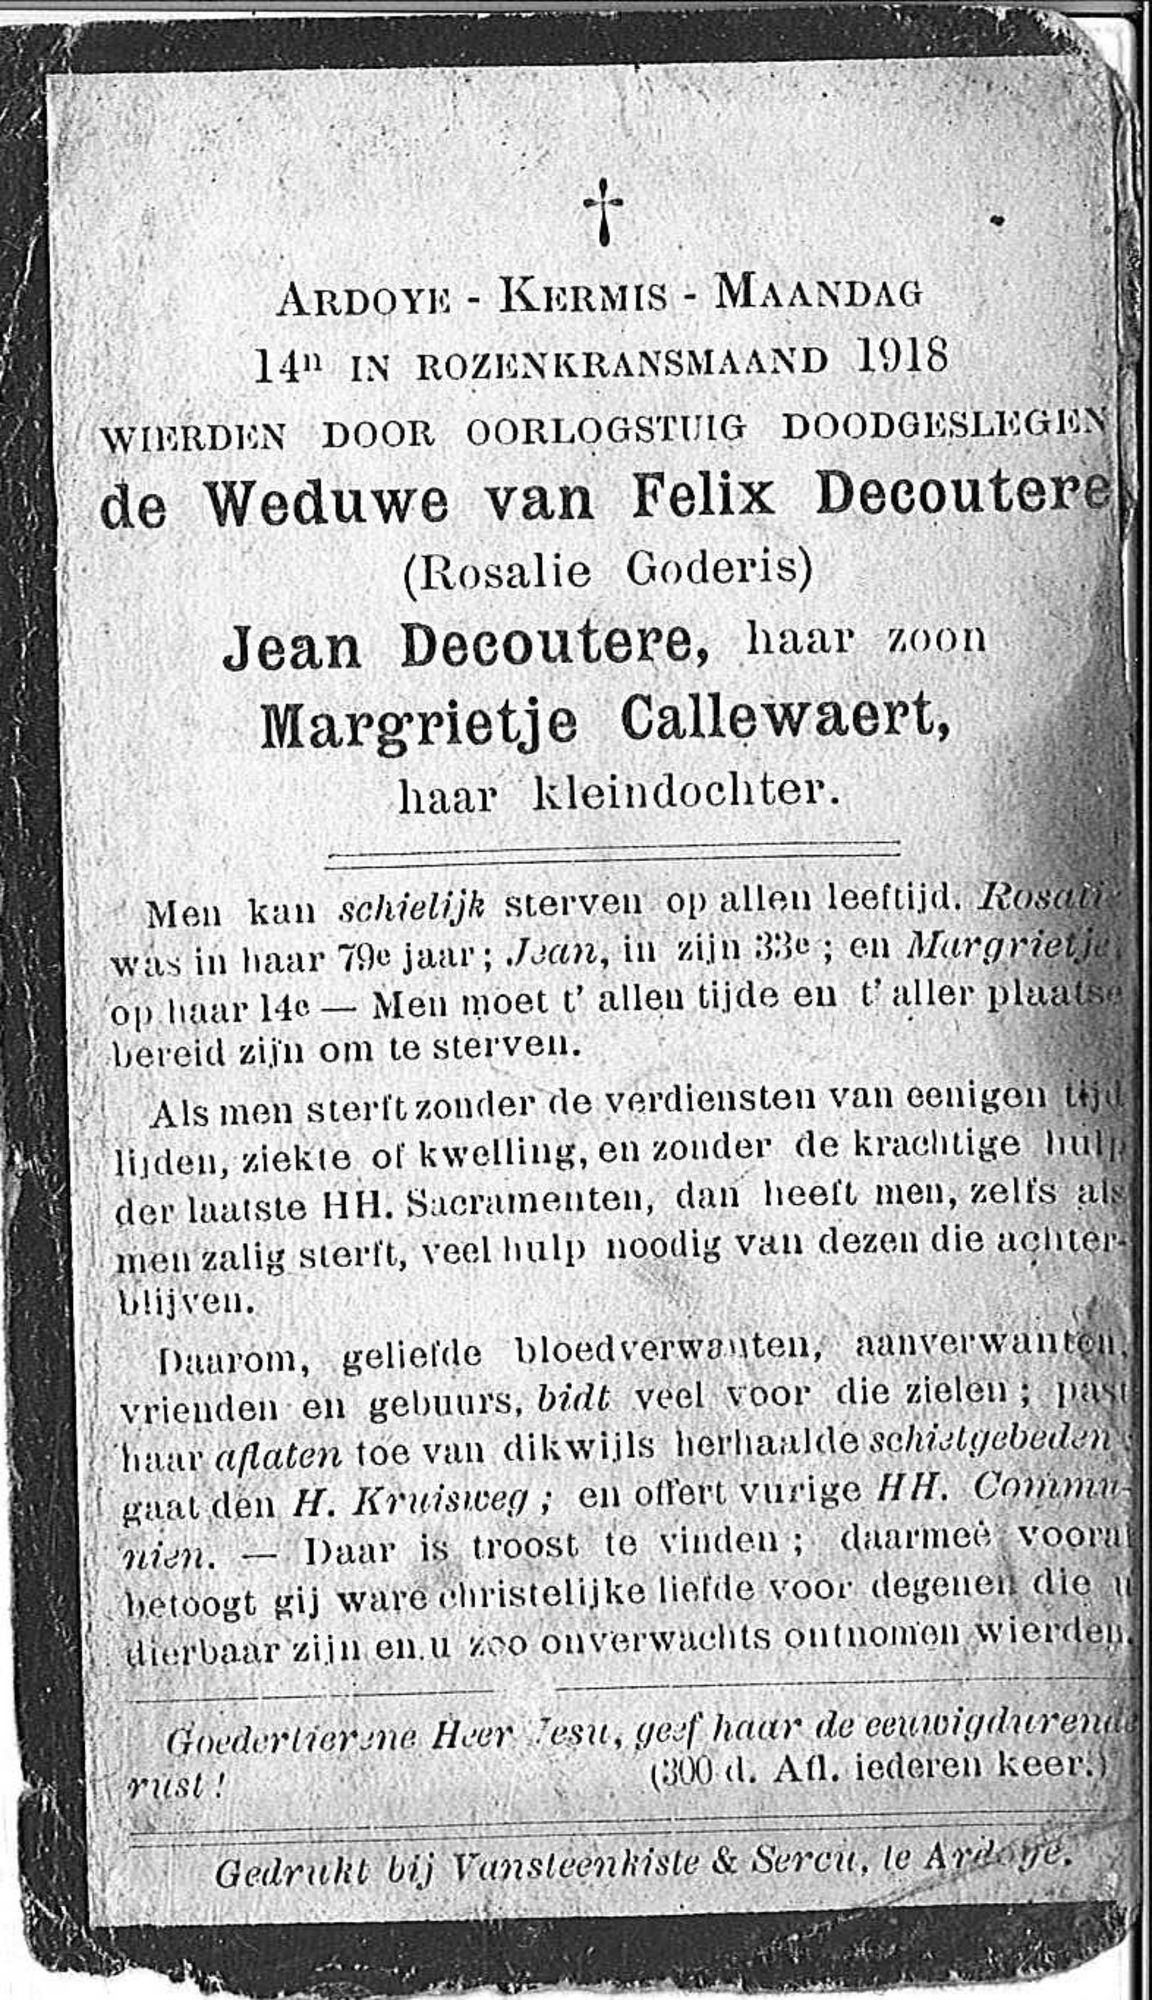 Rosalie Goderis, Jean Decoutere, Margrietje Callewaert